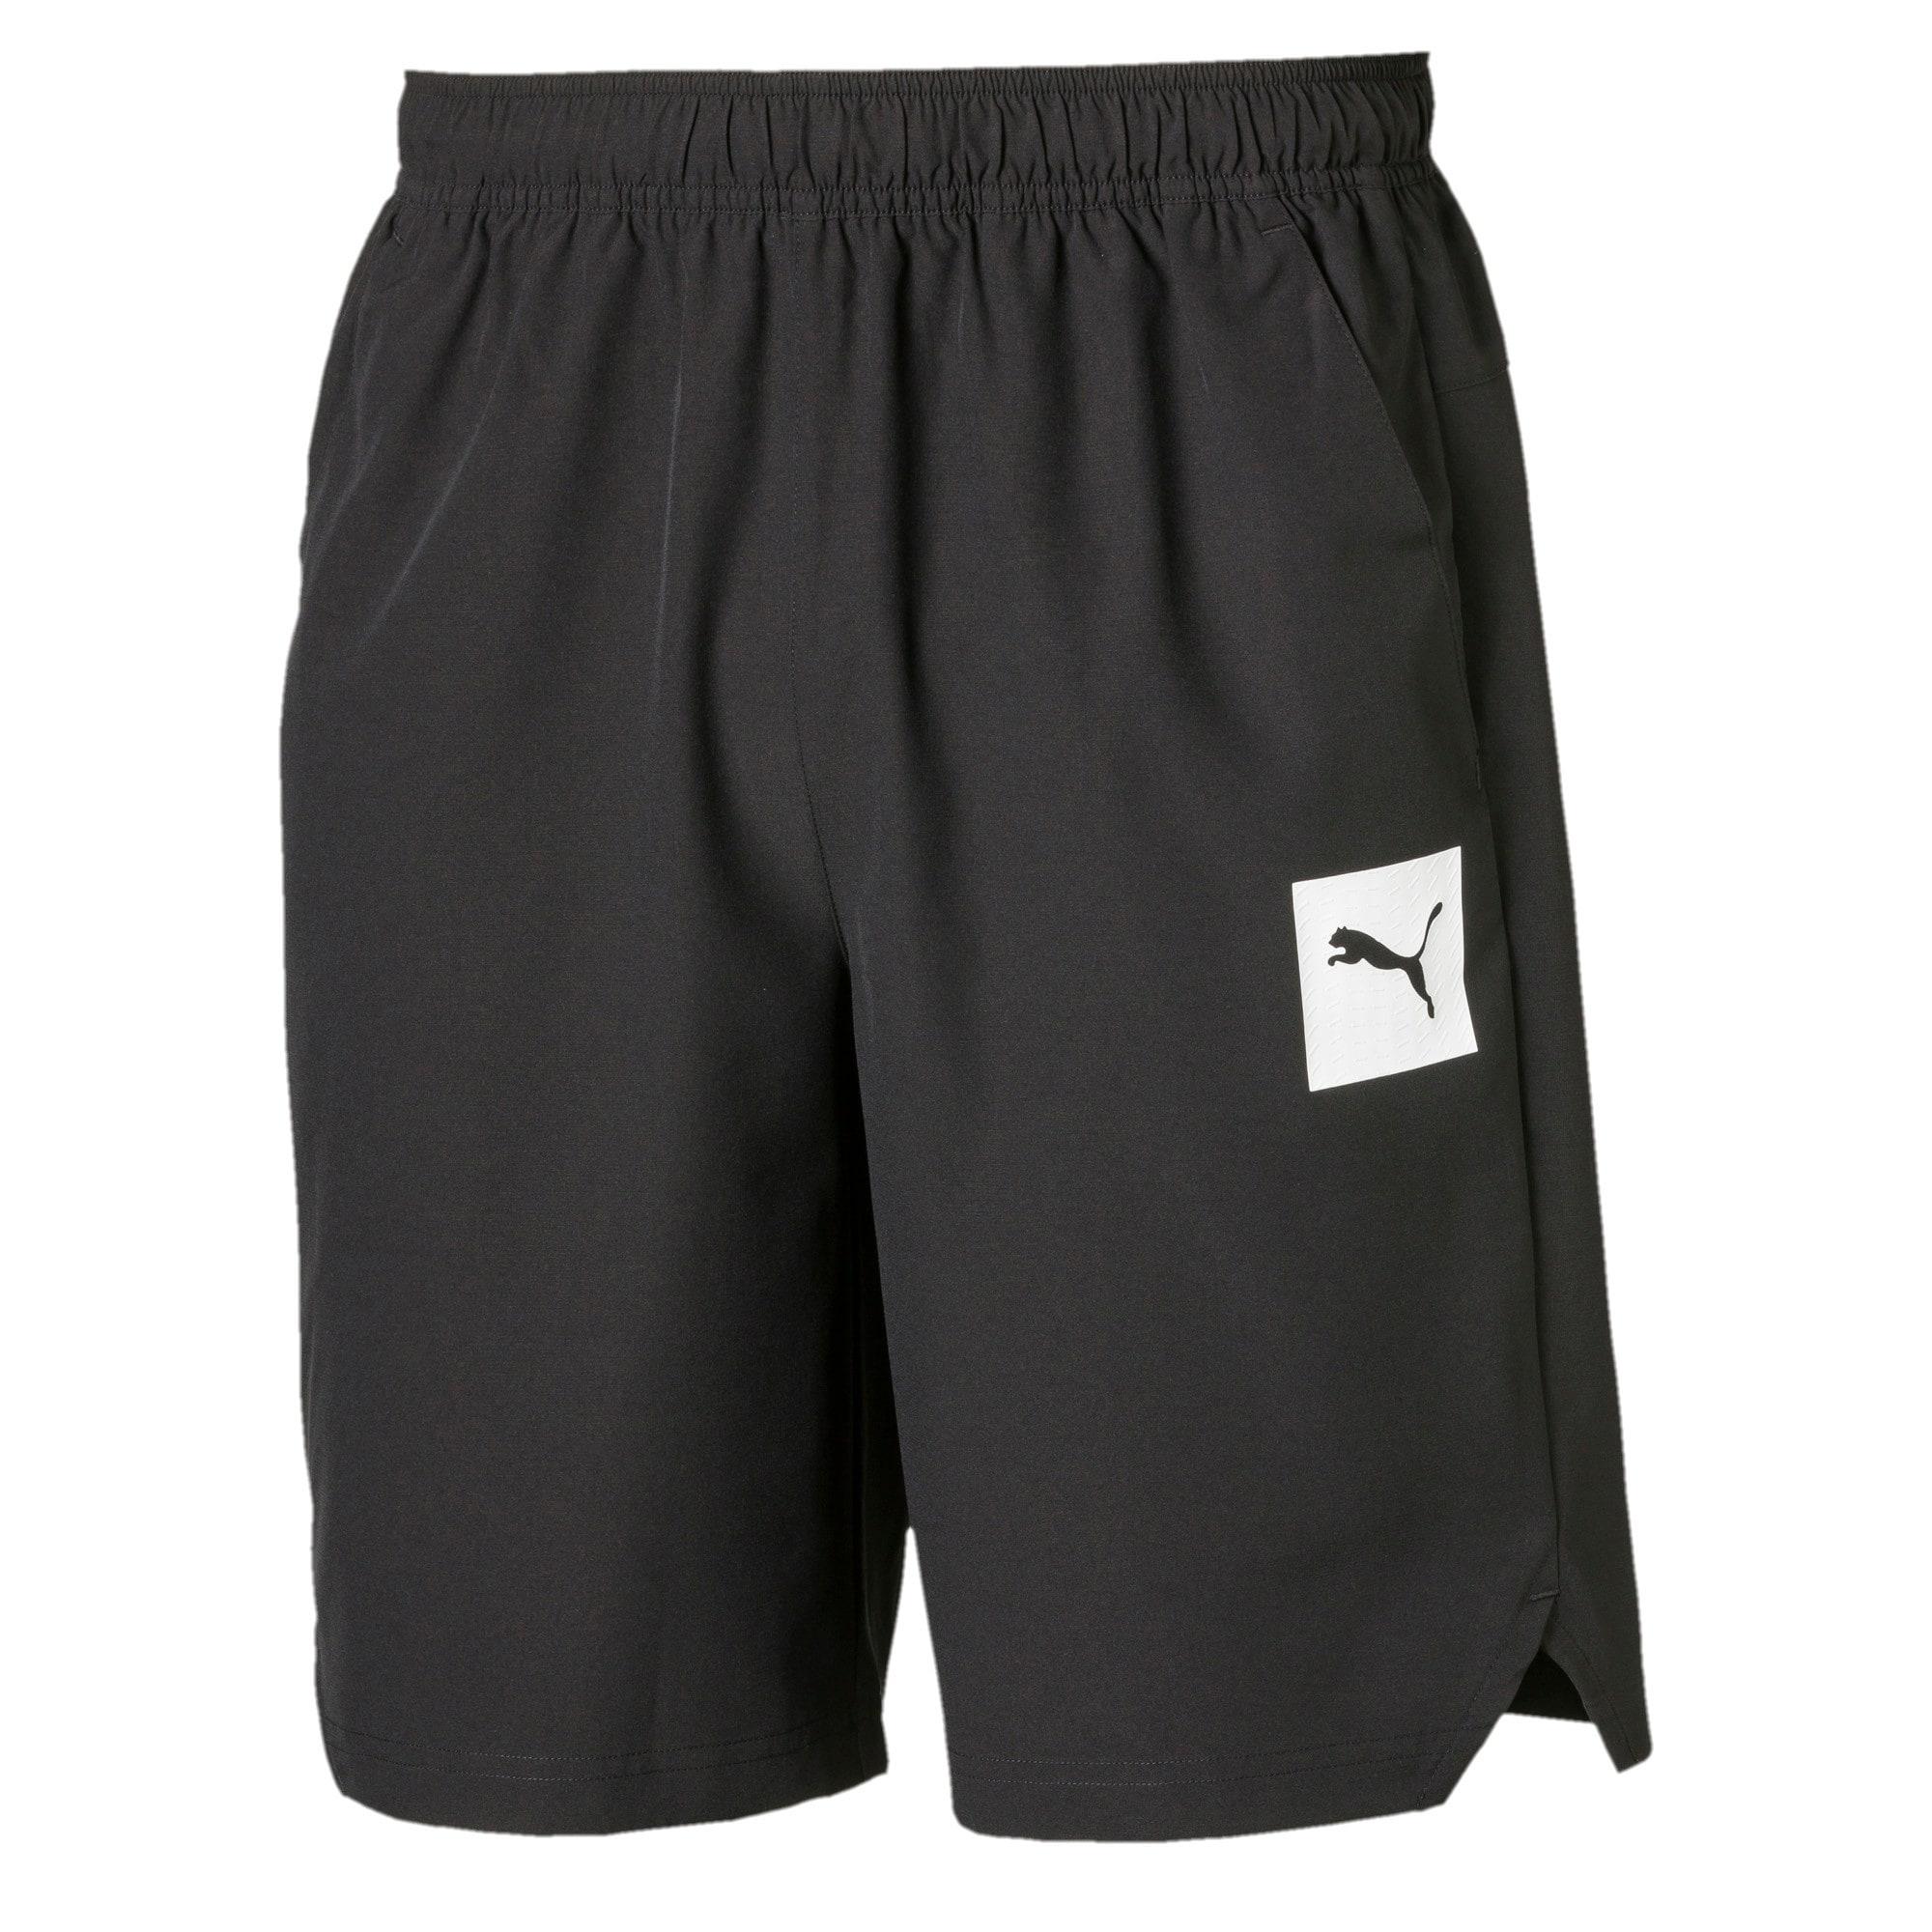 Thumbnail 4 of Tec Sports Men's Woven Shorts, Puma Black, medium-IND